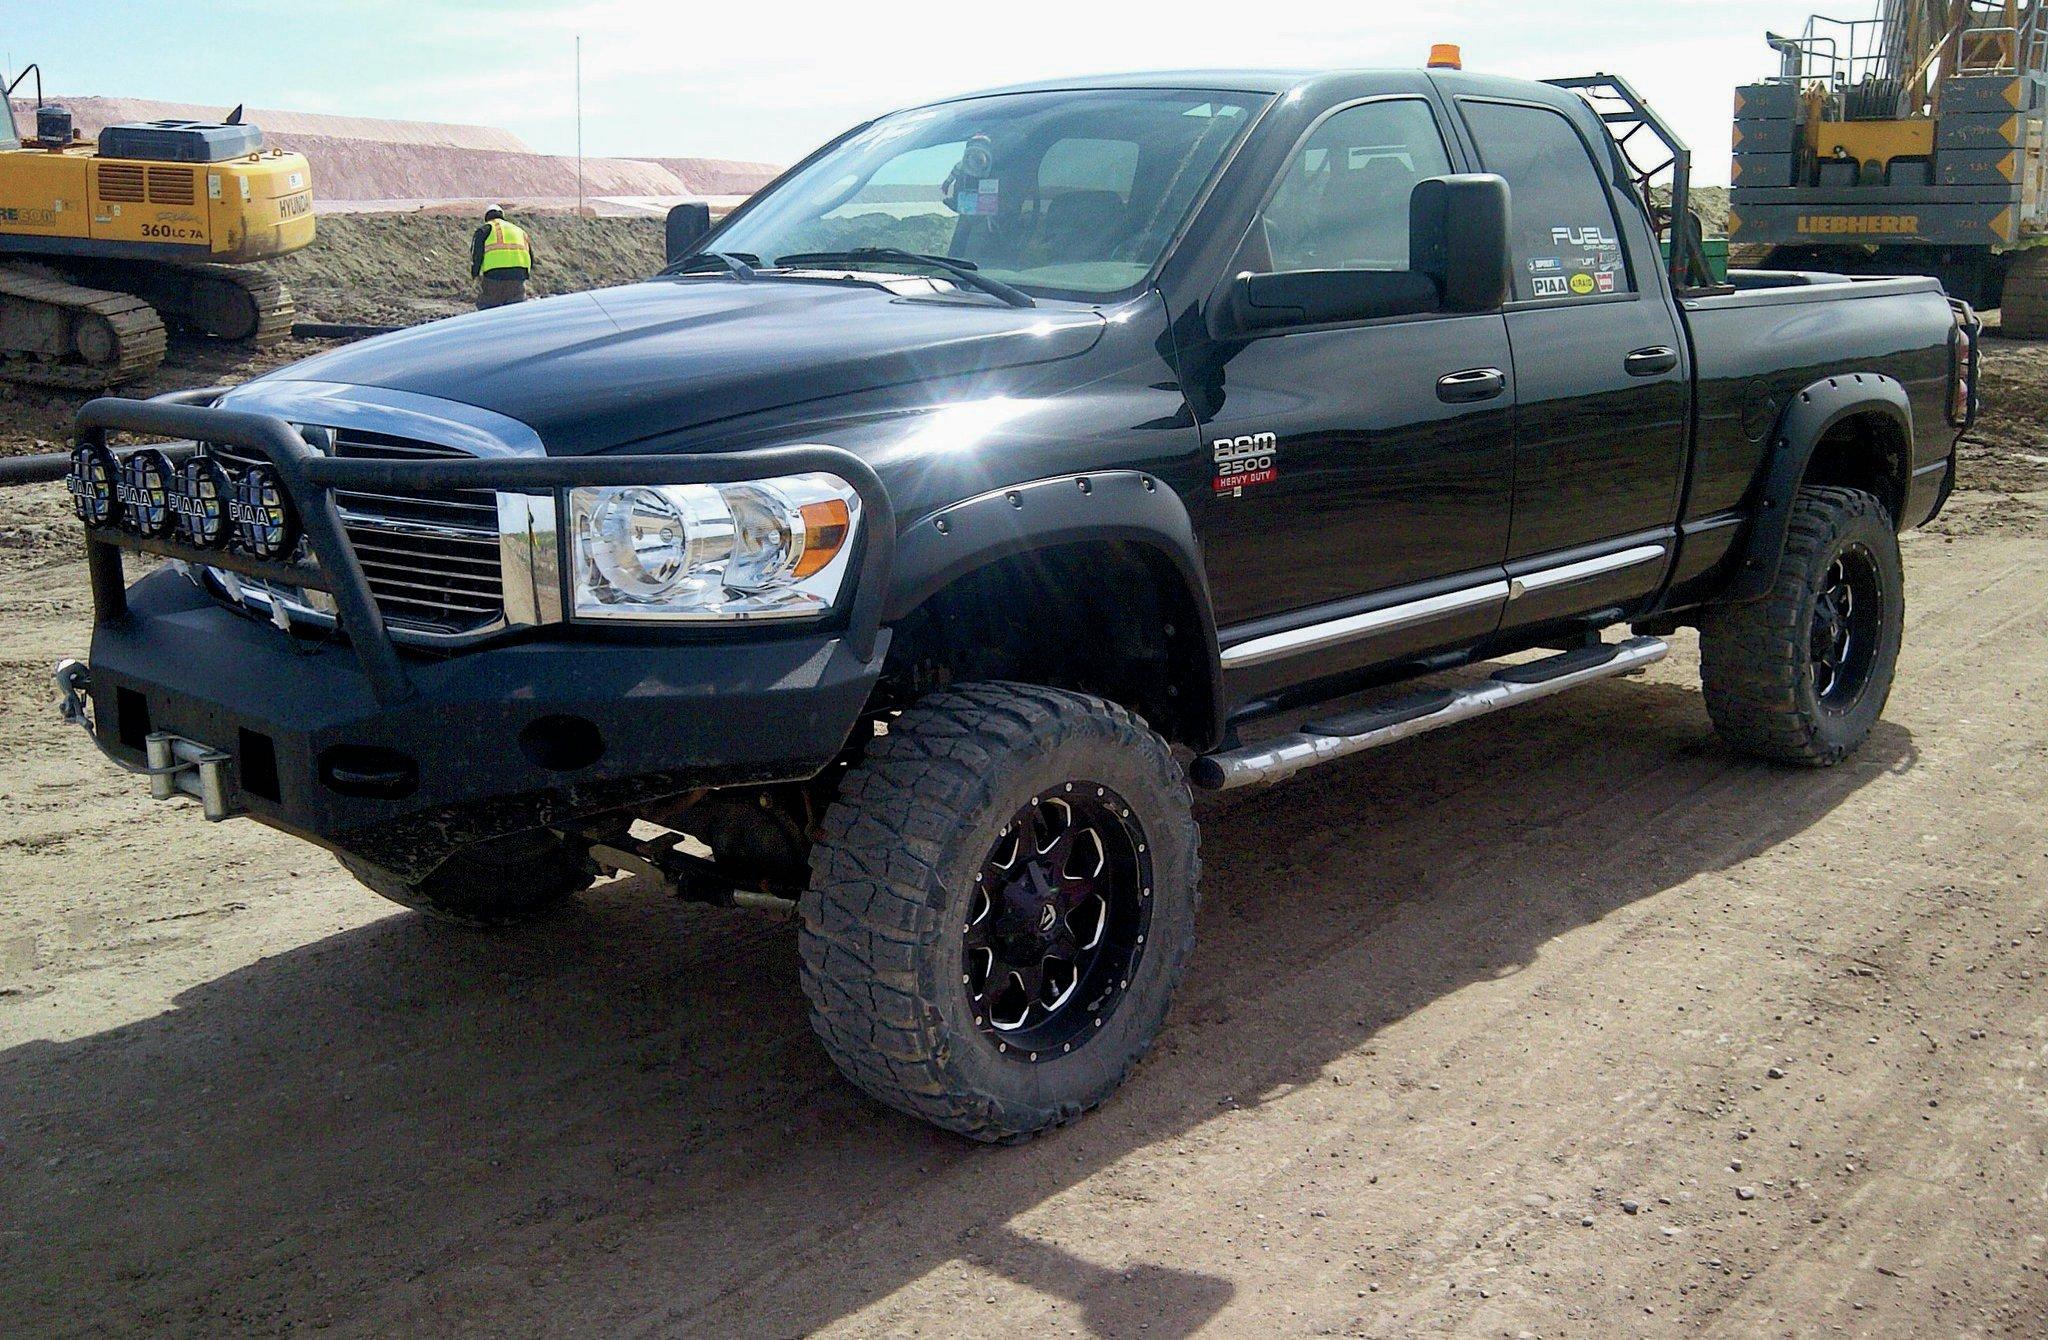 186,099 Cummins-Powered Dodge Ram Trucks Get Recalled for